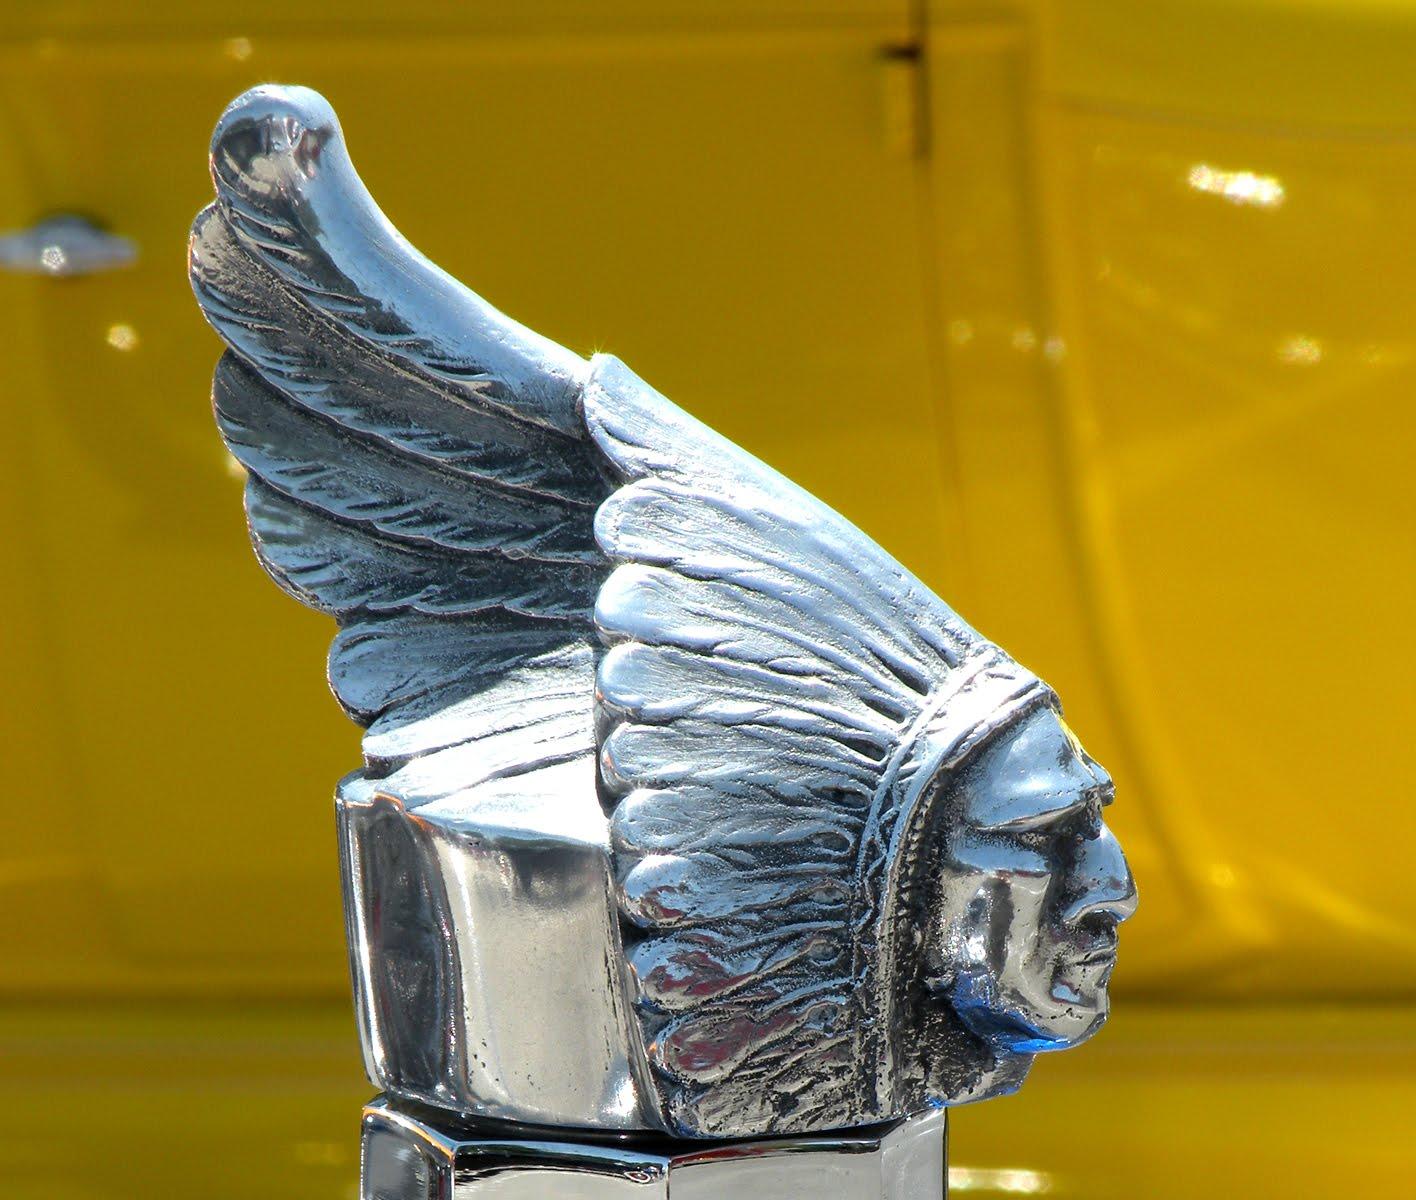 Cool hood ornaments - Cool Radiator Cap Hood Ornament I Haven T Seen Before Might Be A Real Pontiac Piece